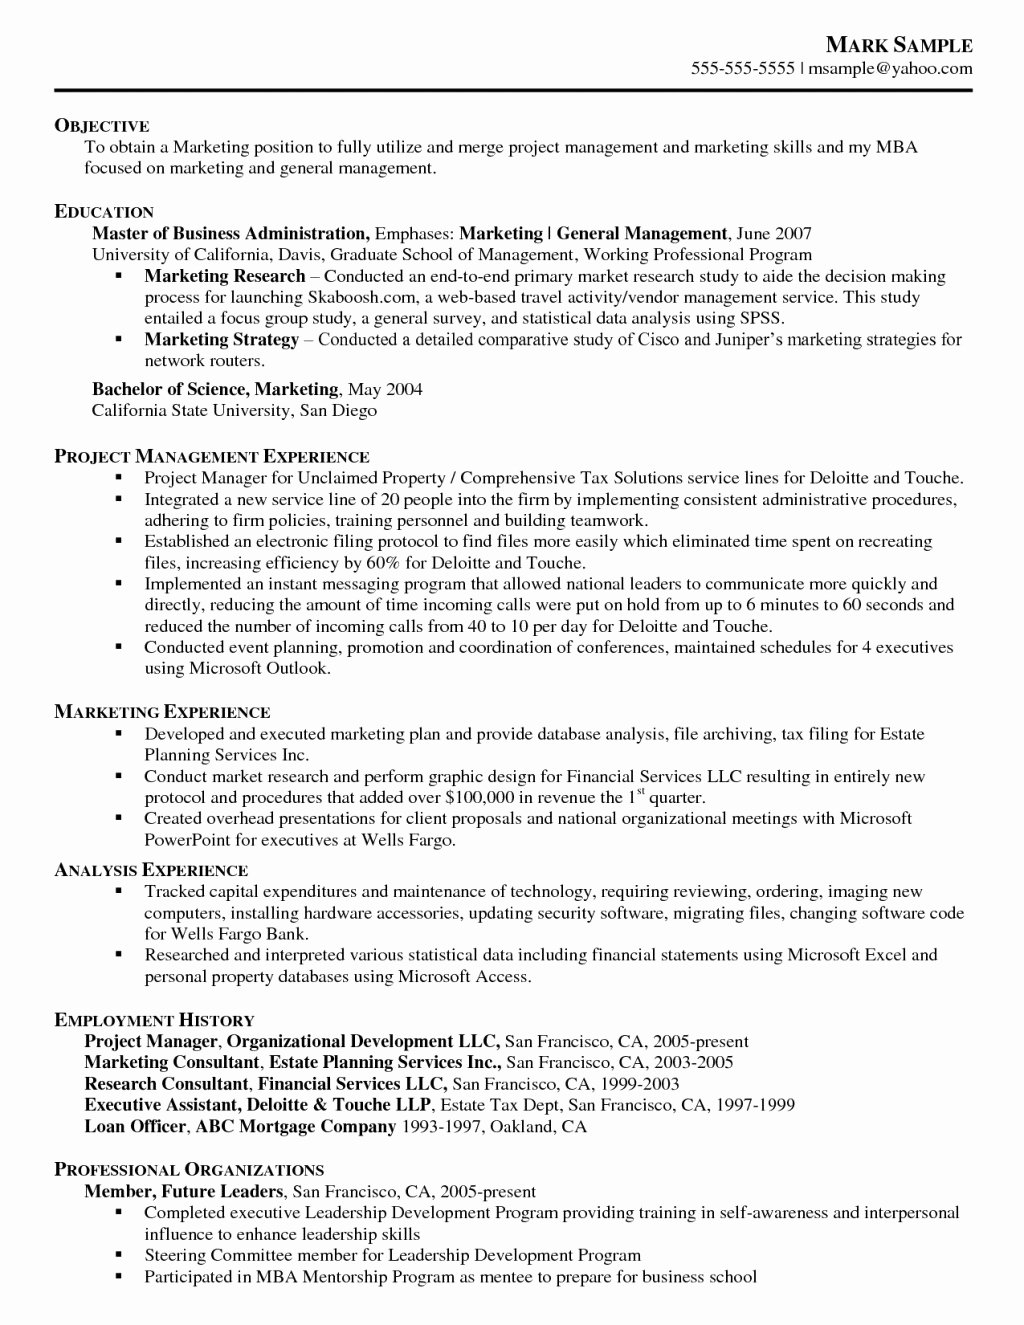 Executive Hybrid Resume Template Beautiful Executive Hybrid Resume Template – Hybrid Resume Template